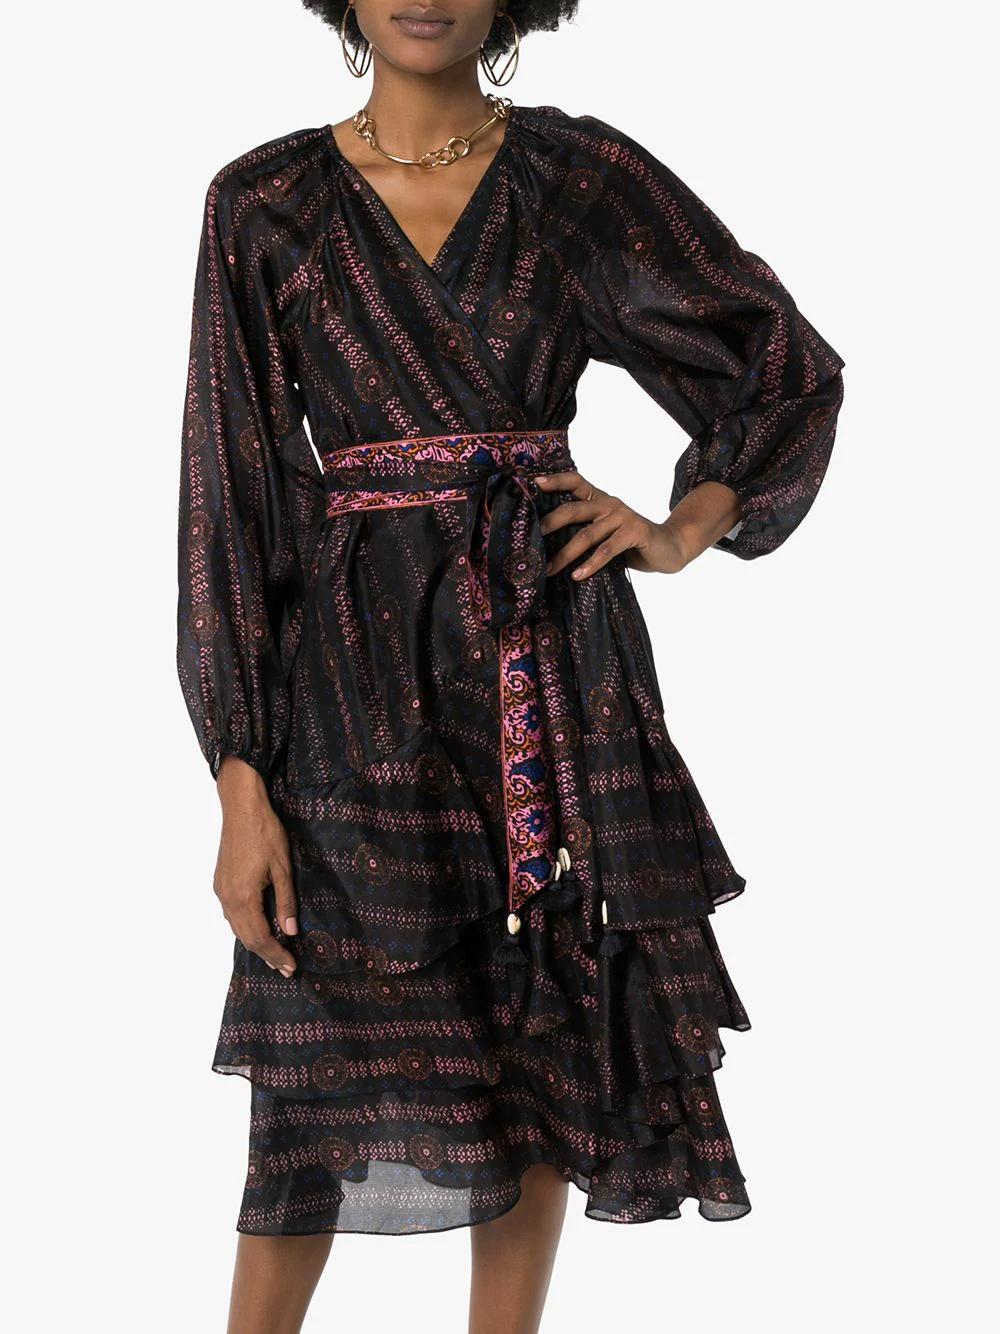 Figue Kira Printed V Neck Dress Farfetch Dresses V Neck Dress Long Sleeve Dress [ 1334 x 1000 Pixel ]